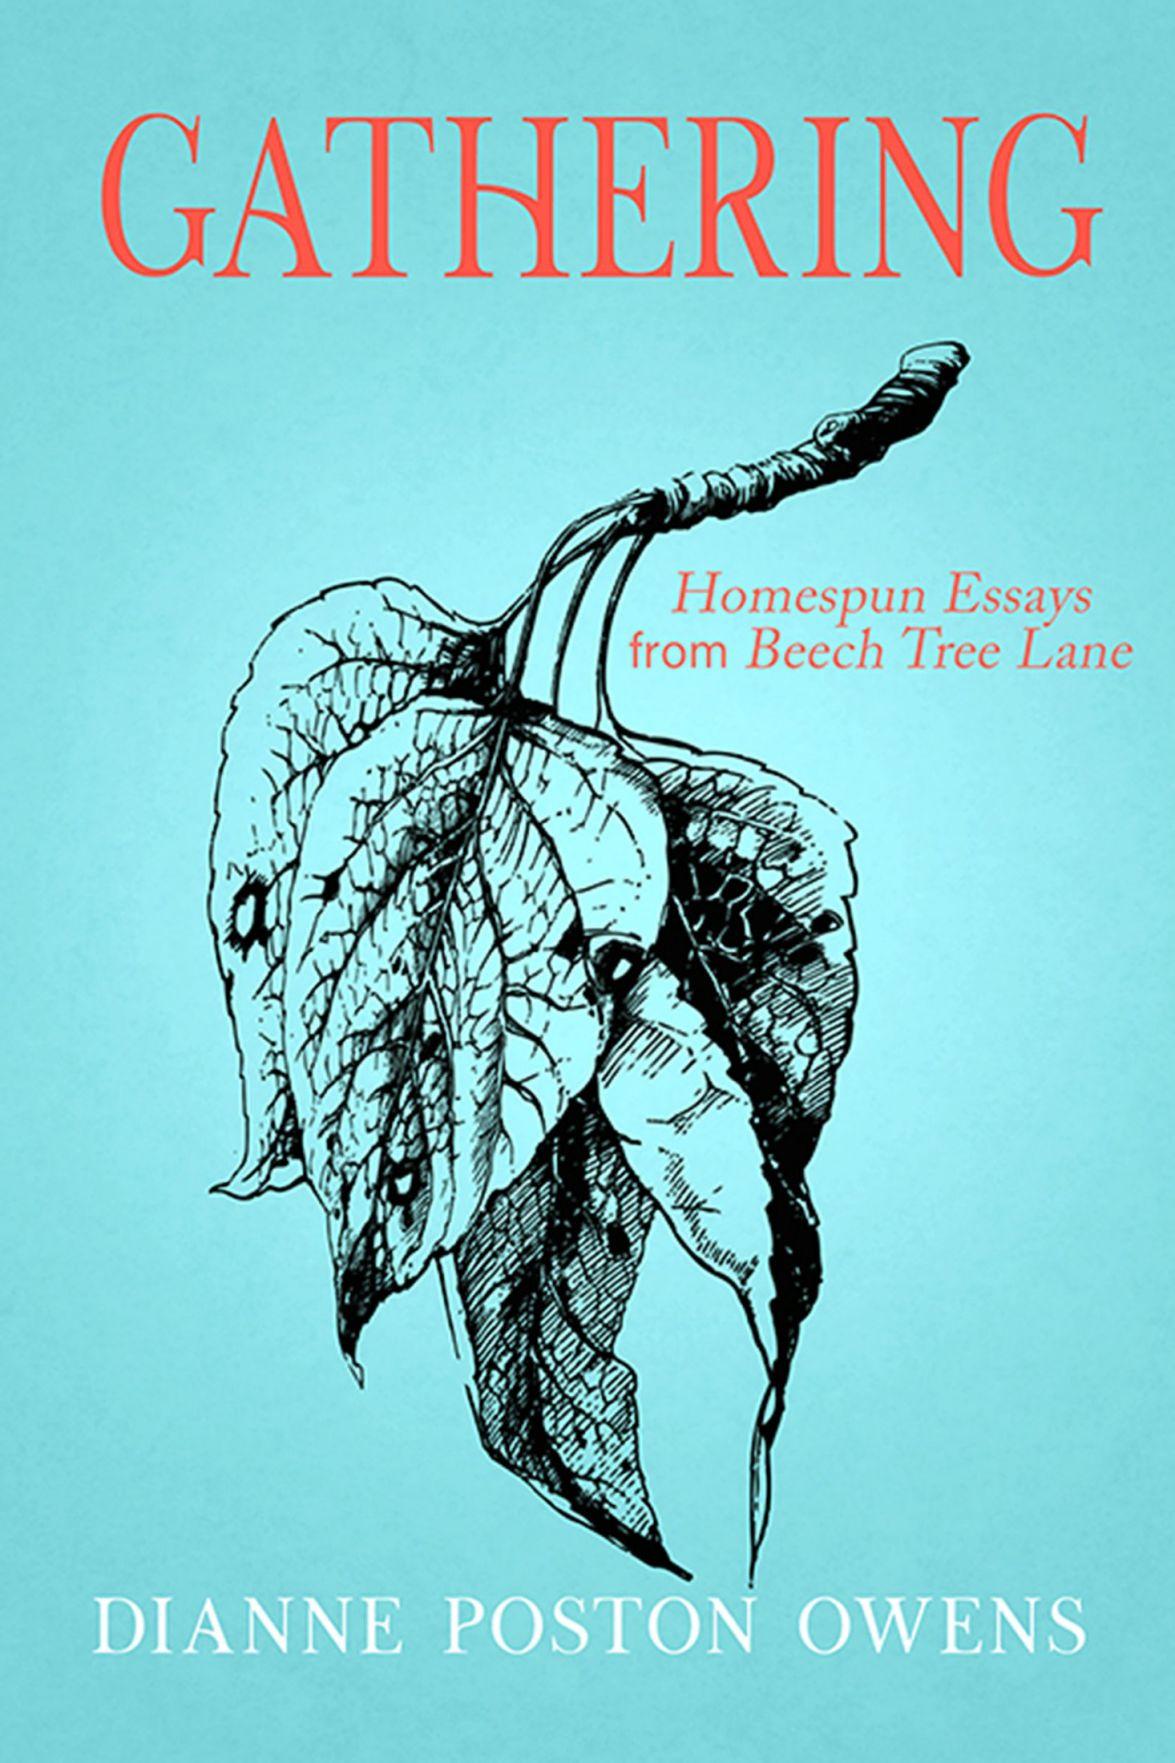 """Gathering: Homespun Essays from Beech Tree Lane"""